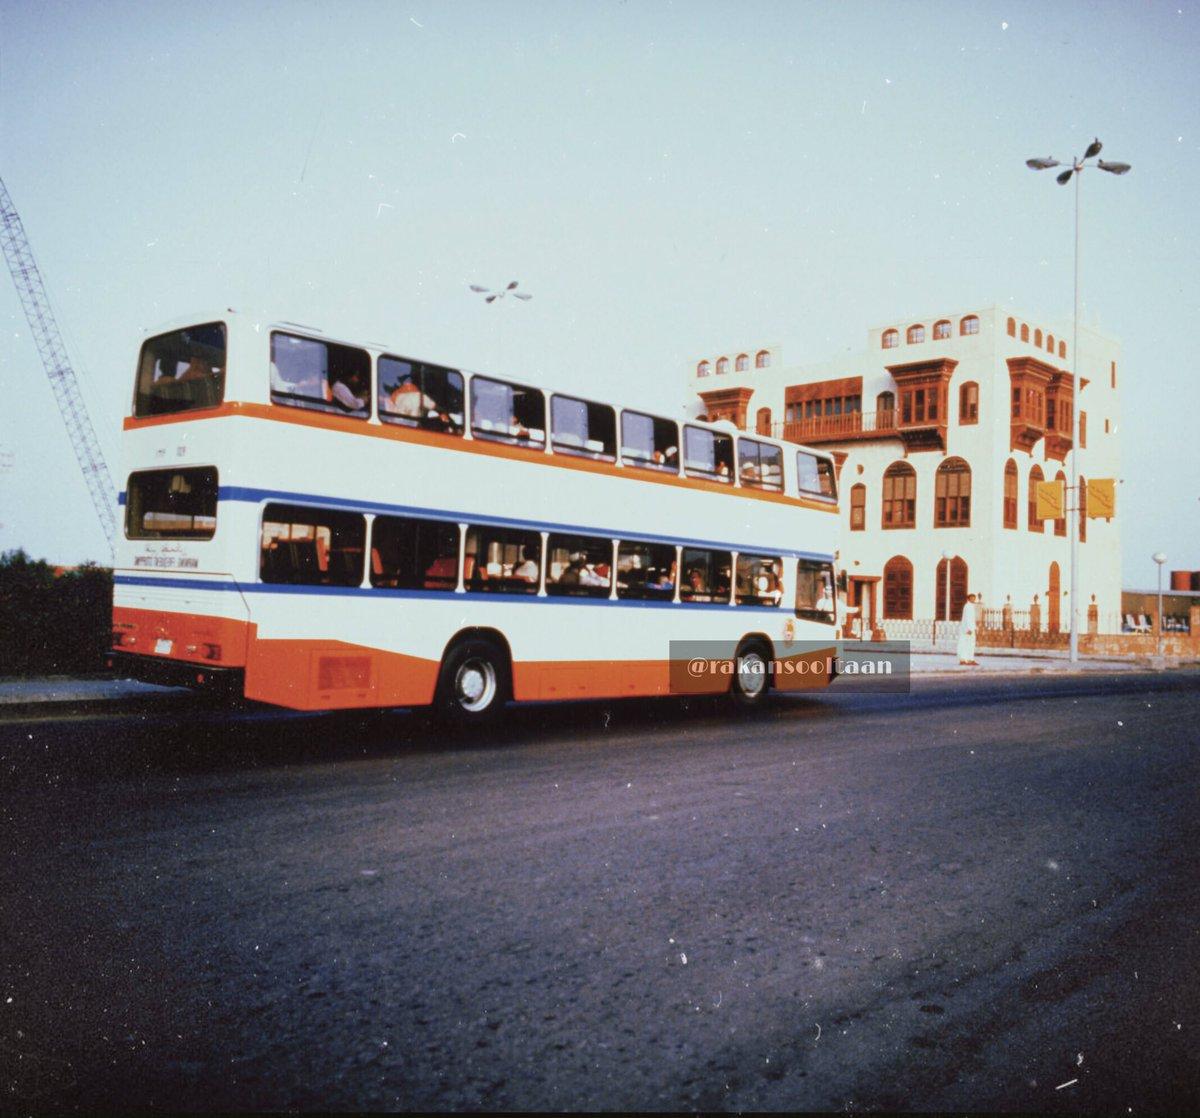 Twitter पर Rakan Sooltaan حافلات النقل الحماعي سابتكو بدأت نشاطها في الرياض عام ١٣٩٩هـ ثم انتشرت في باقي المدن صورة نادرة من جده غير تعود الى بداية الثمانينات الميلادية وتظهر حافلة